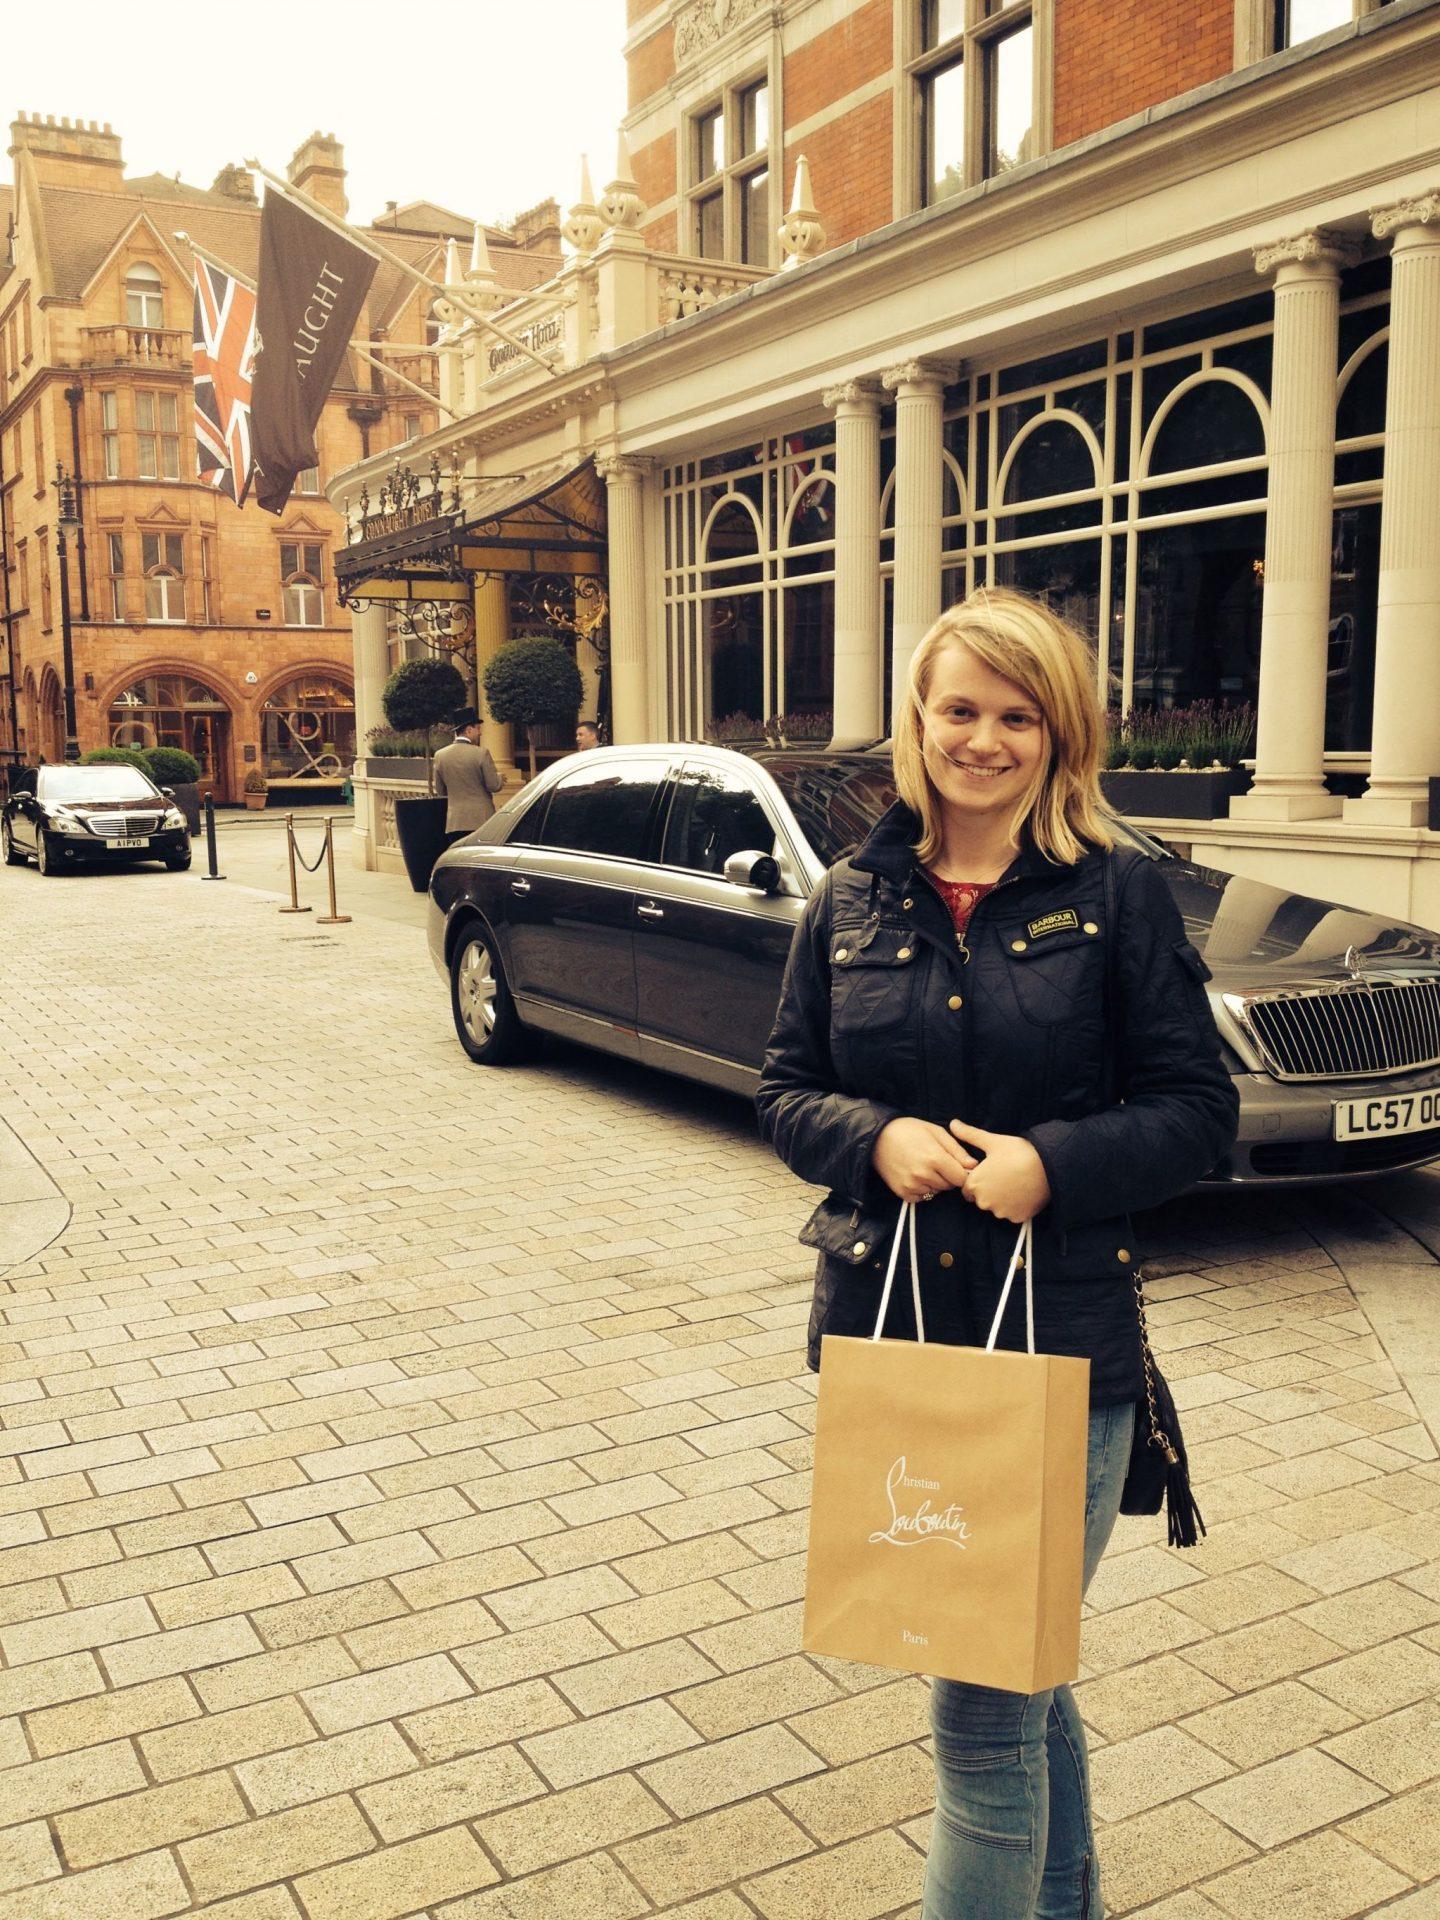 Buying Louboutins in London